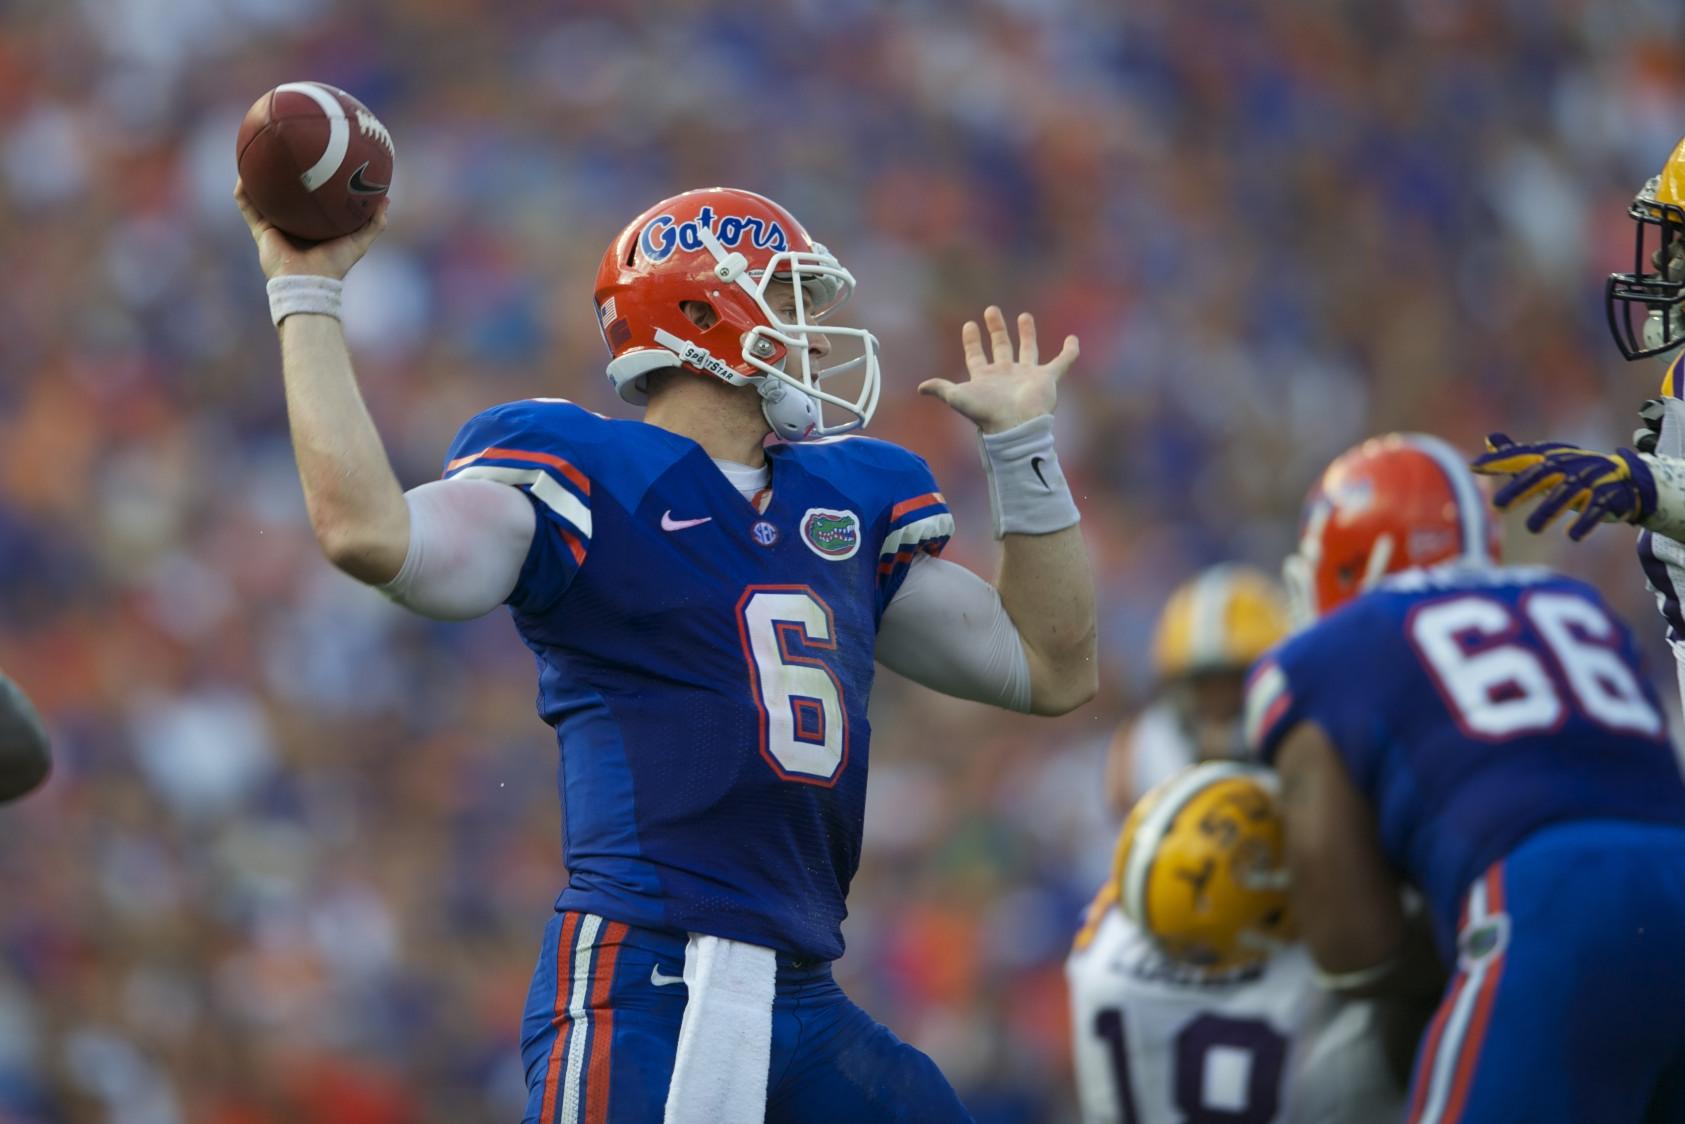 Florida quarterback Jeff Driskel